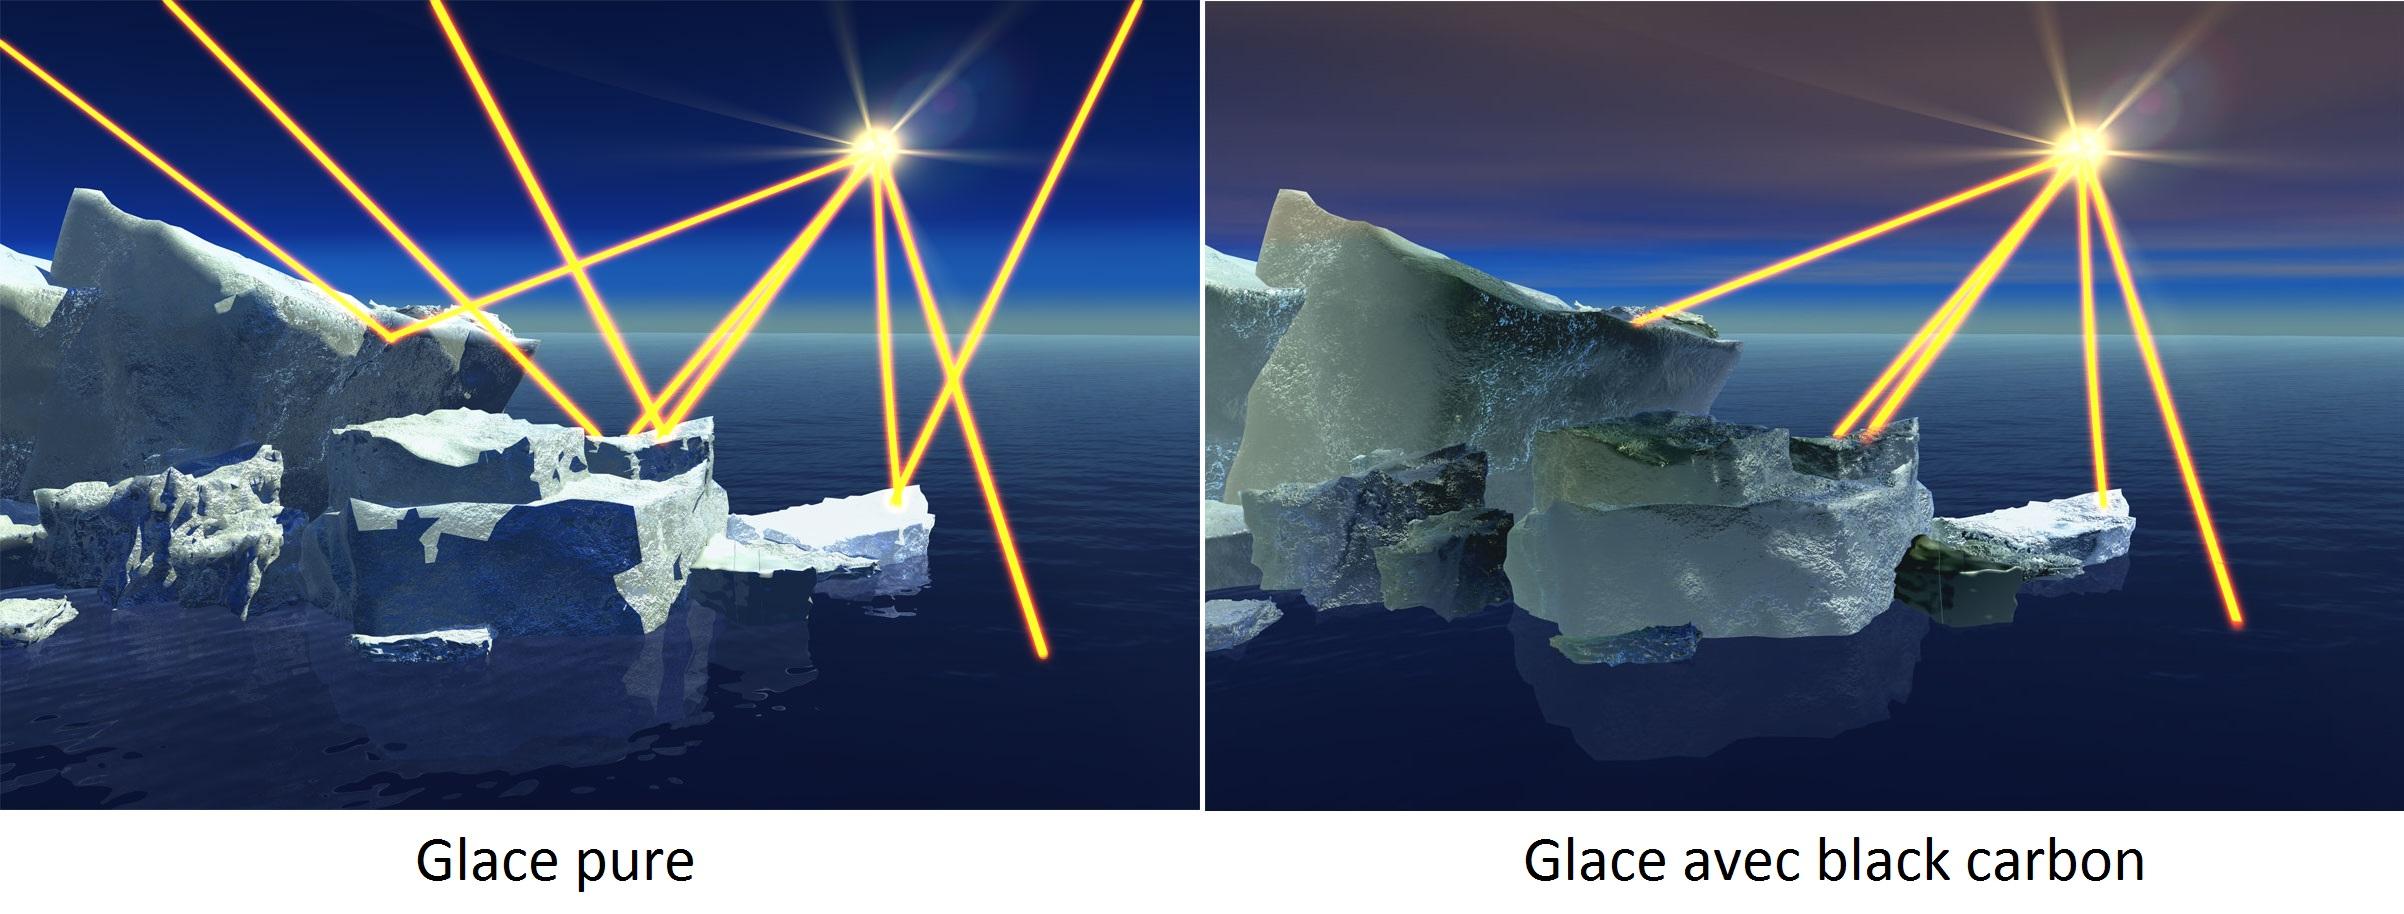 Icecleanprint